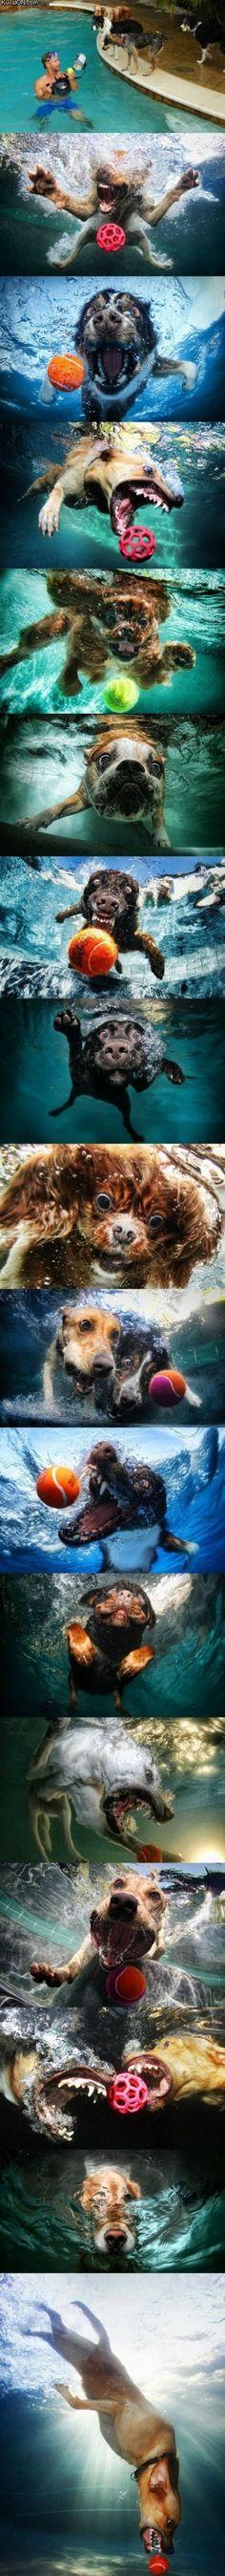 Dog pics with an underwater camera LittleFriendsPhoto